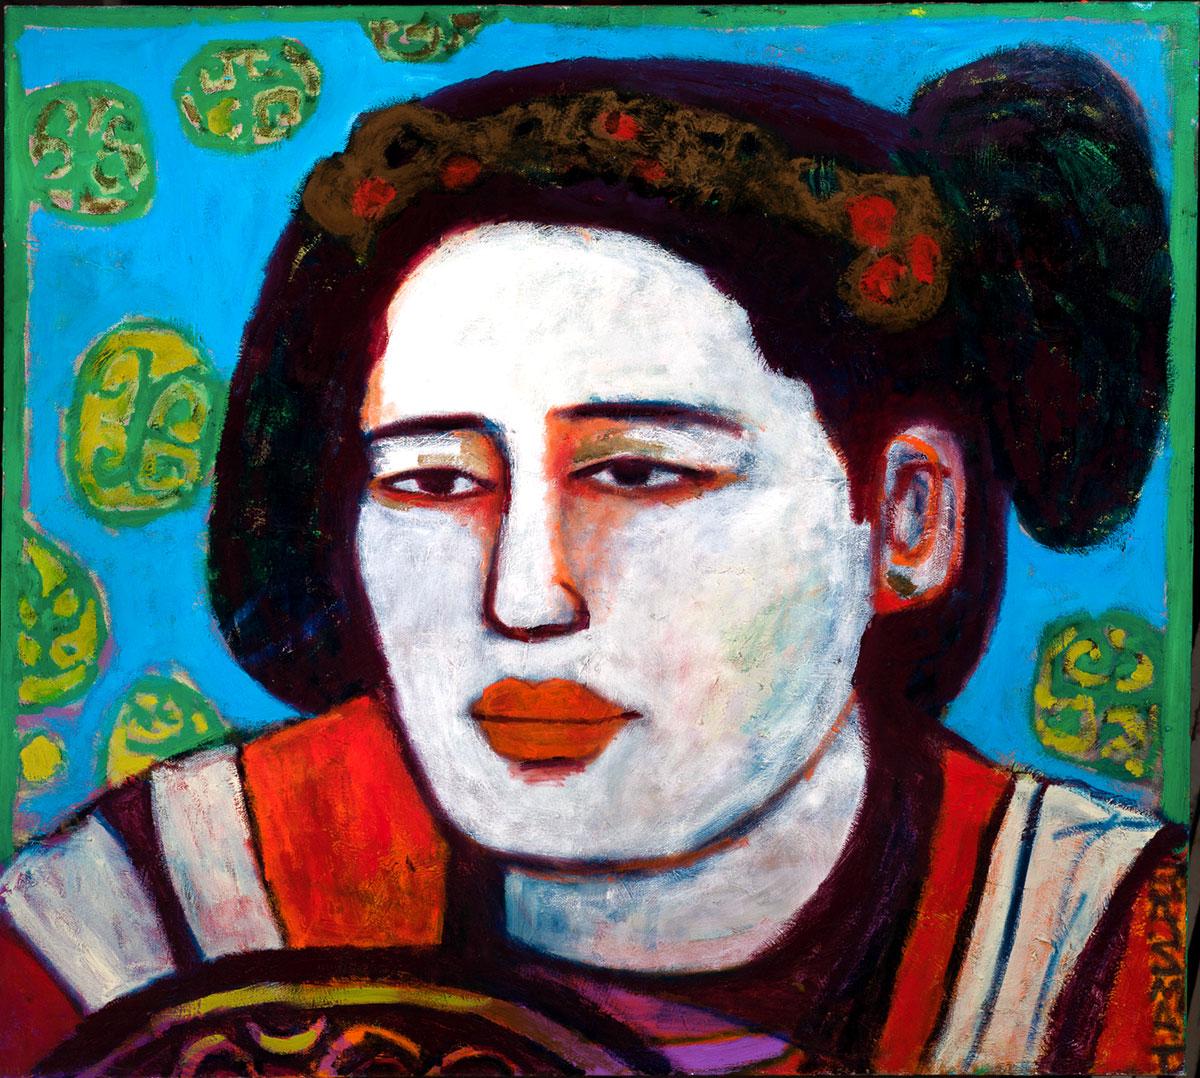 Tang Dynasty #11  - 140cm x 150cm, Oil on Canvas